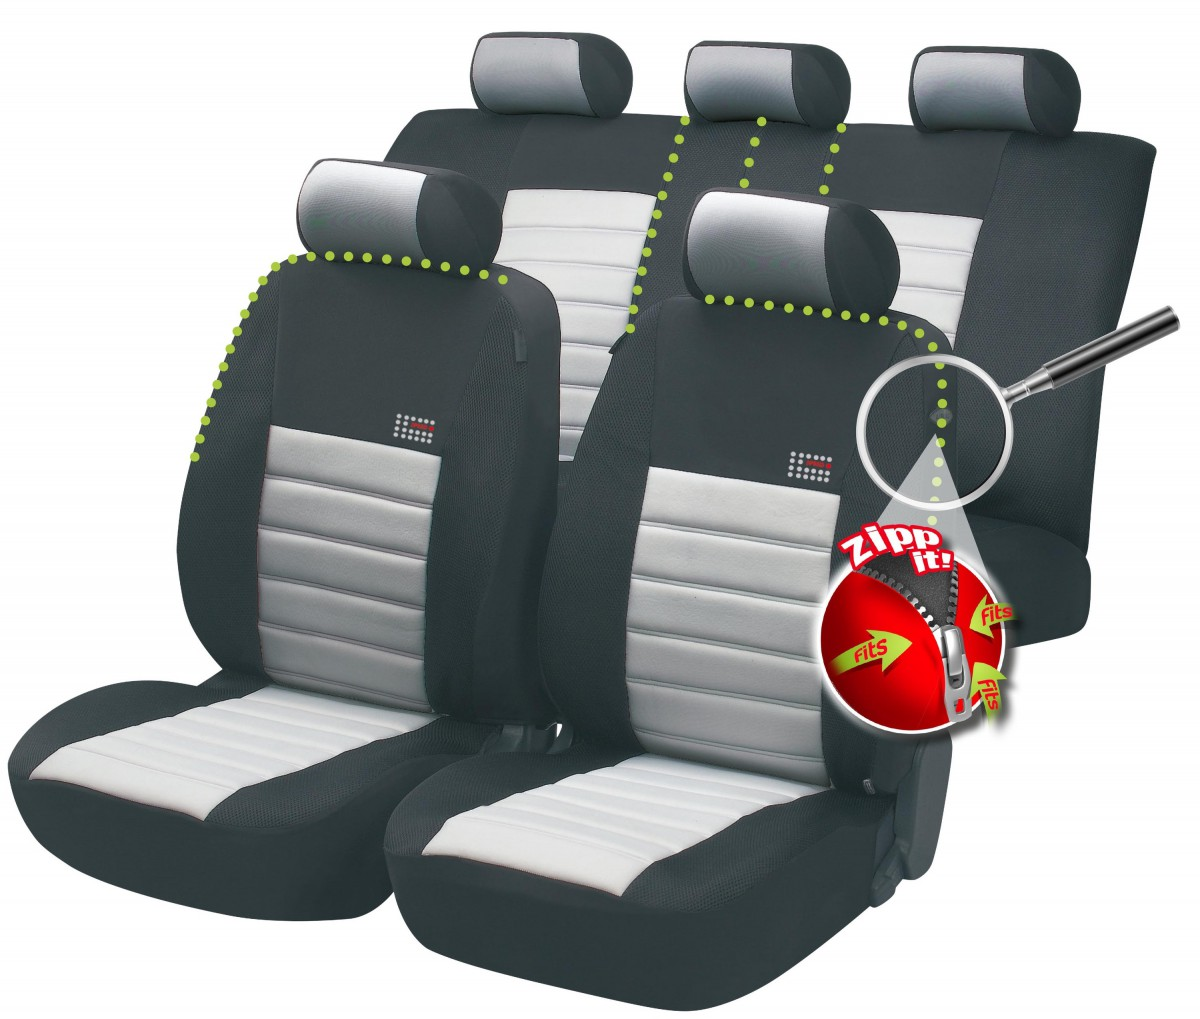 Schwarz-blaue Sitzbezüge für SUBARU IMPREZA Autositzbezug NUR FAHRERSITZ